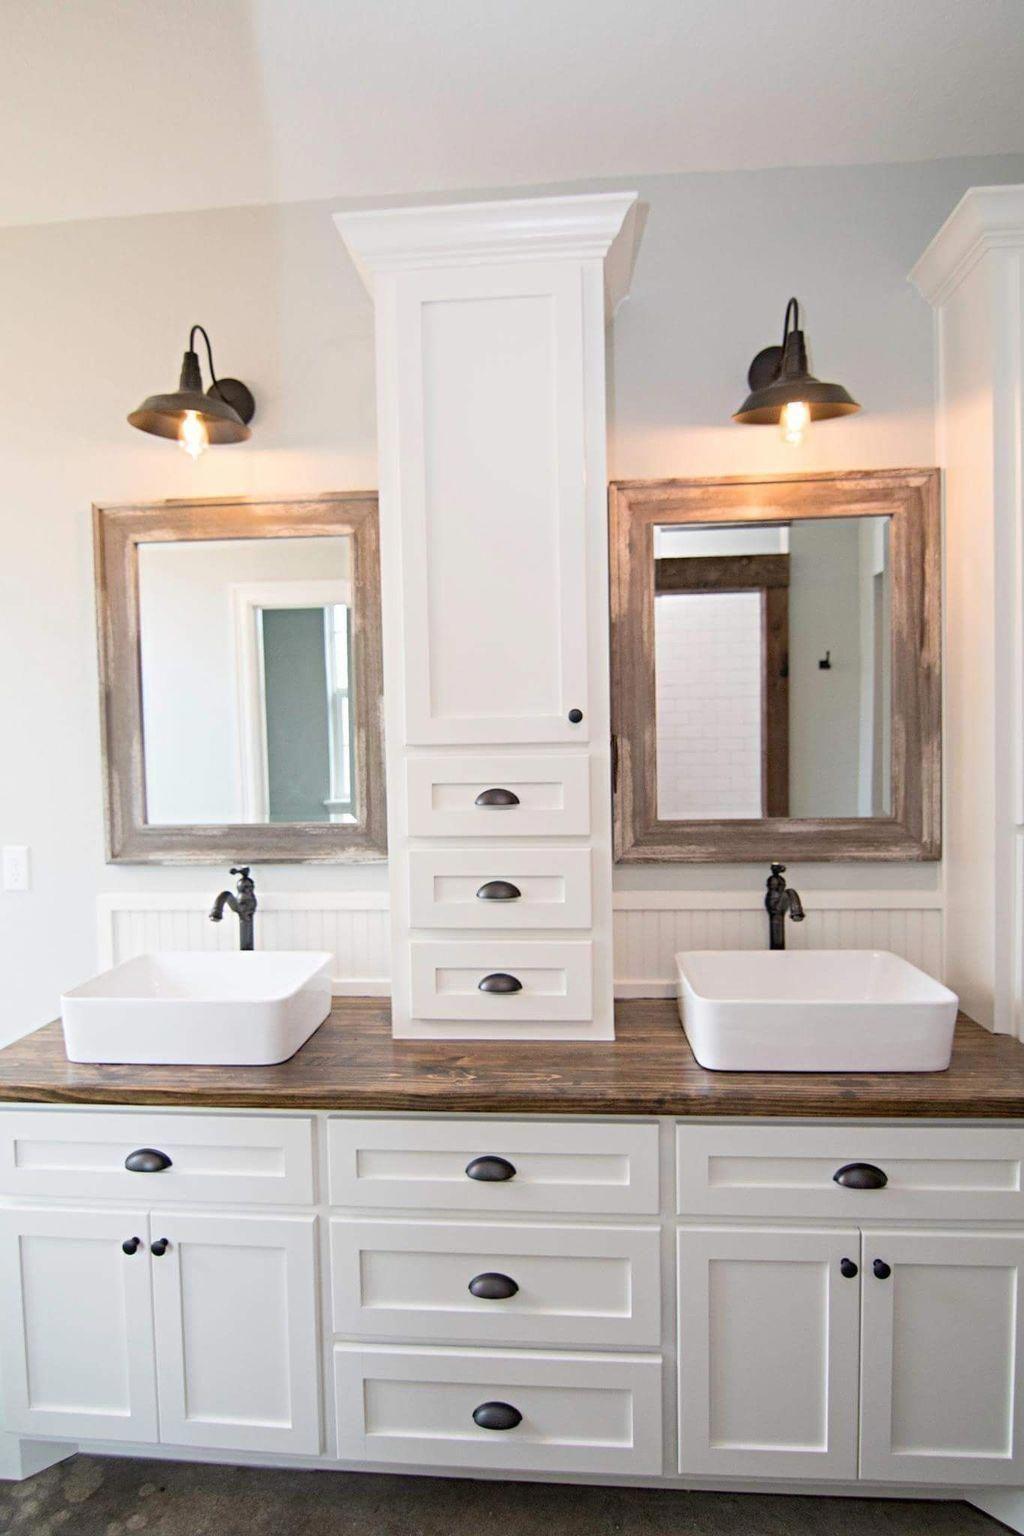 30 Impressive Master Bathroom Remodel Ideas Before After Images Bathroom Remodel Master Bathroom Layout Small Bathroom